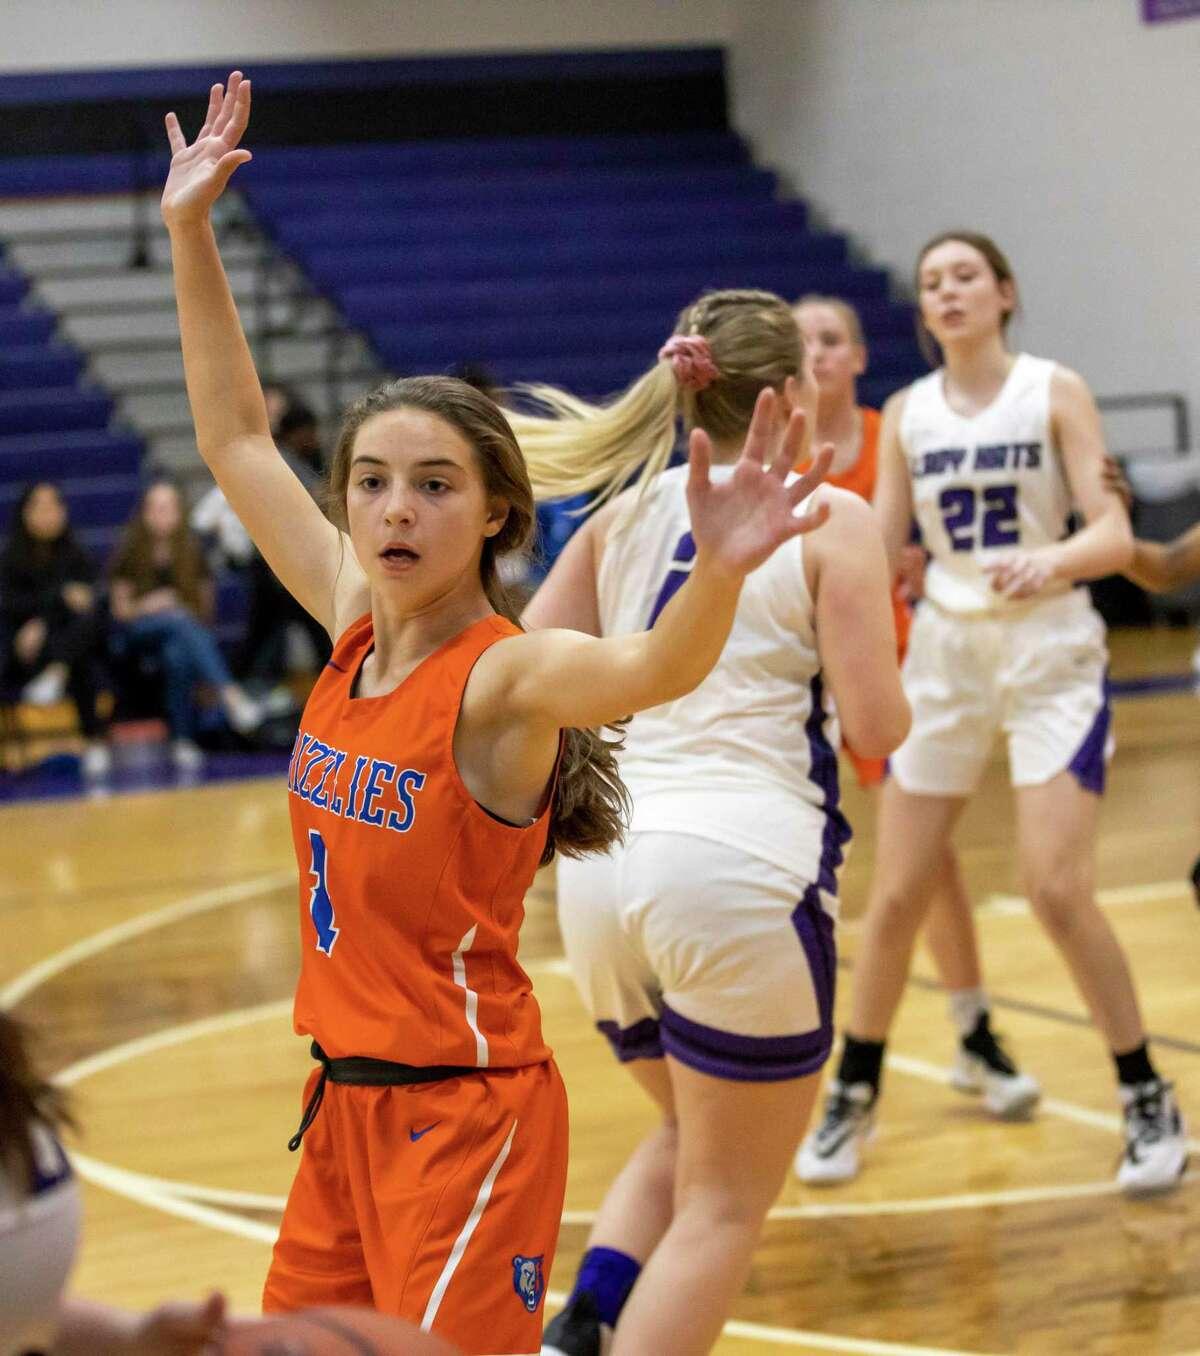 Grand Oaks guard Lauren Moylan (1) prepares to block a pass from Willis high school during a junior varsity high school basketball match, Tuesday, Jan. 21, 2020, in Willis.